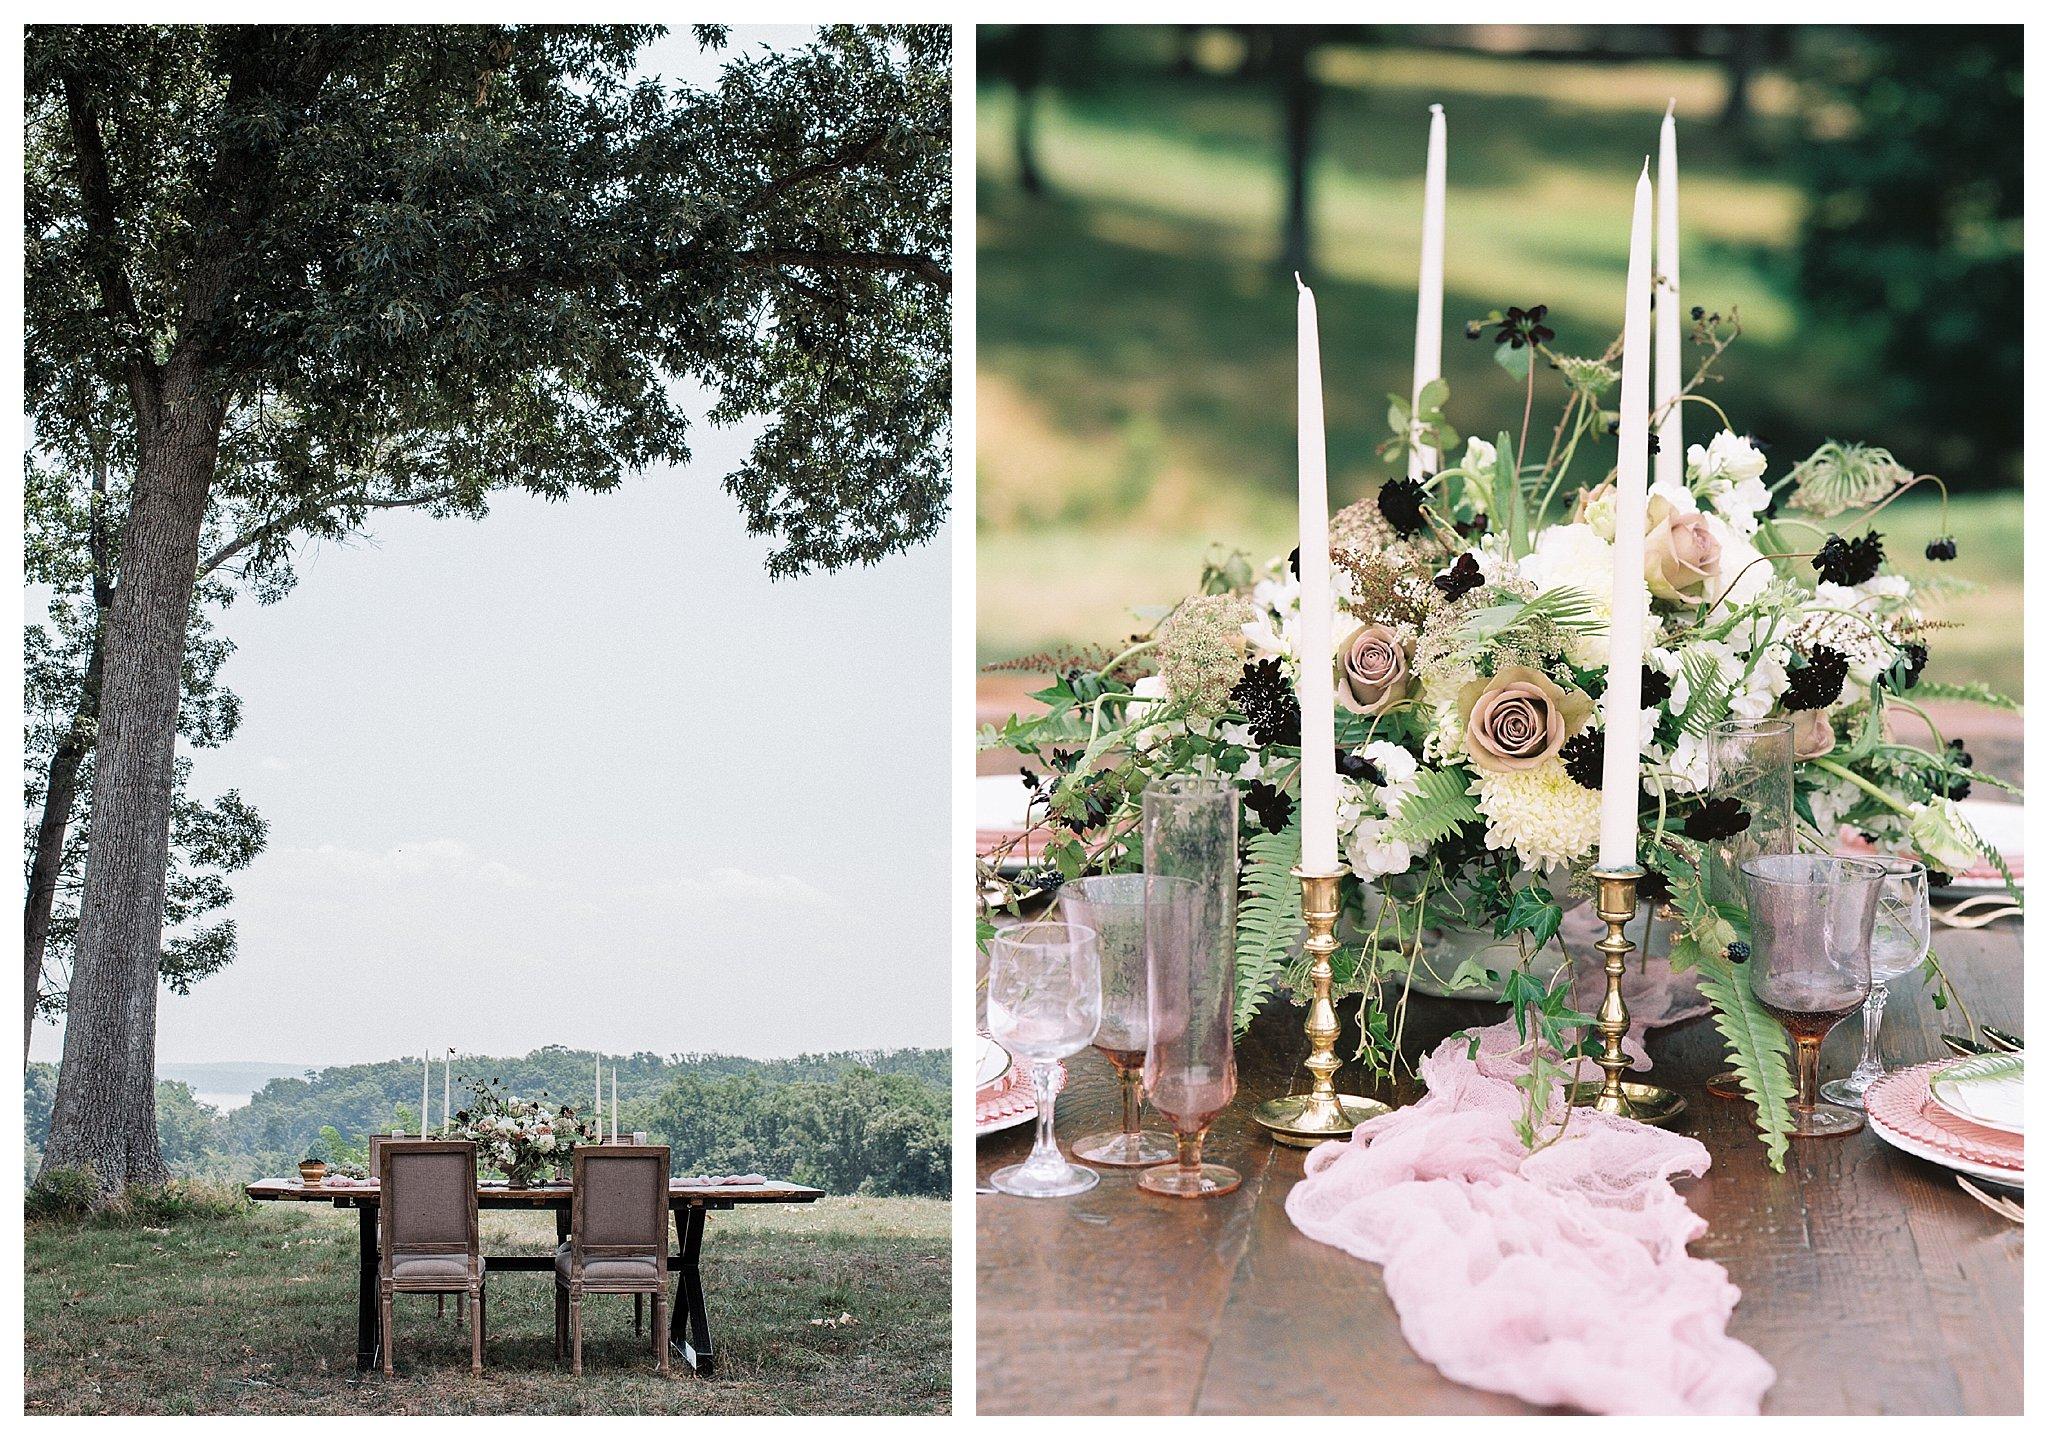 Virginia Fine Art Wedding Photographer Gunston Hall Wedding   Andrea Rodway Photography